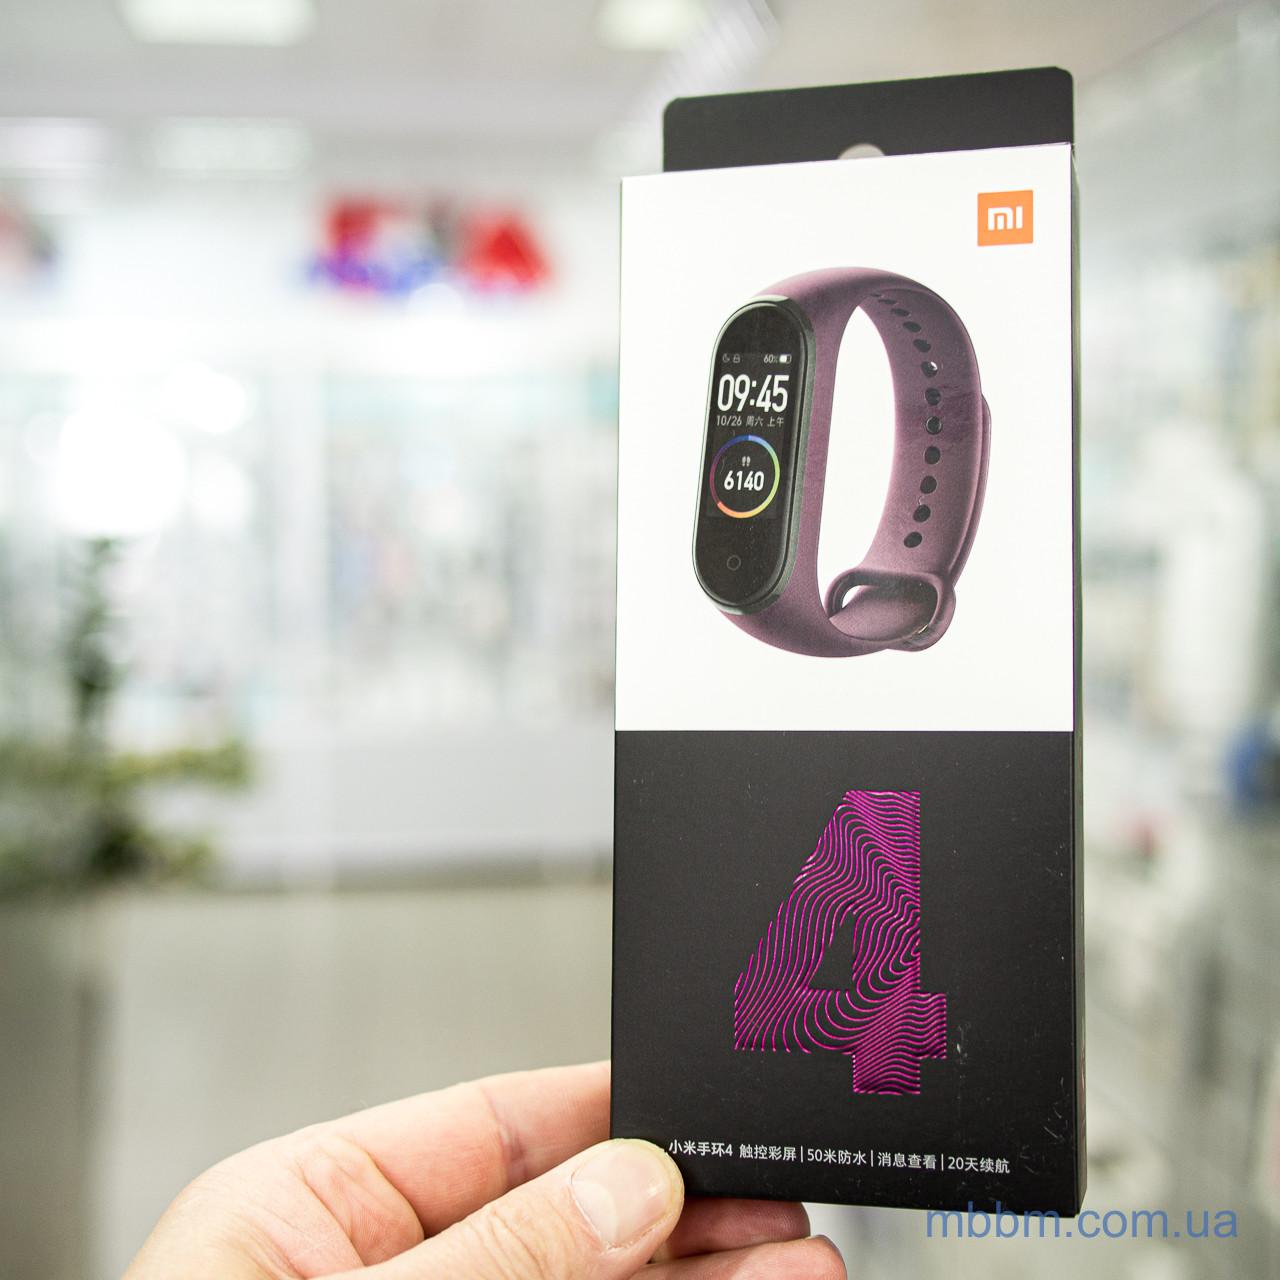 Фитнес-браслет Xiaomi Mi Band 4 [CN] red Оригинал! (MGW4050CN) EAN/UPC: 6934177710193